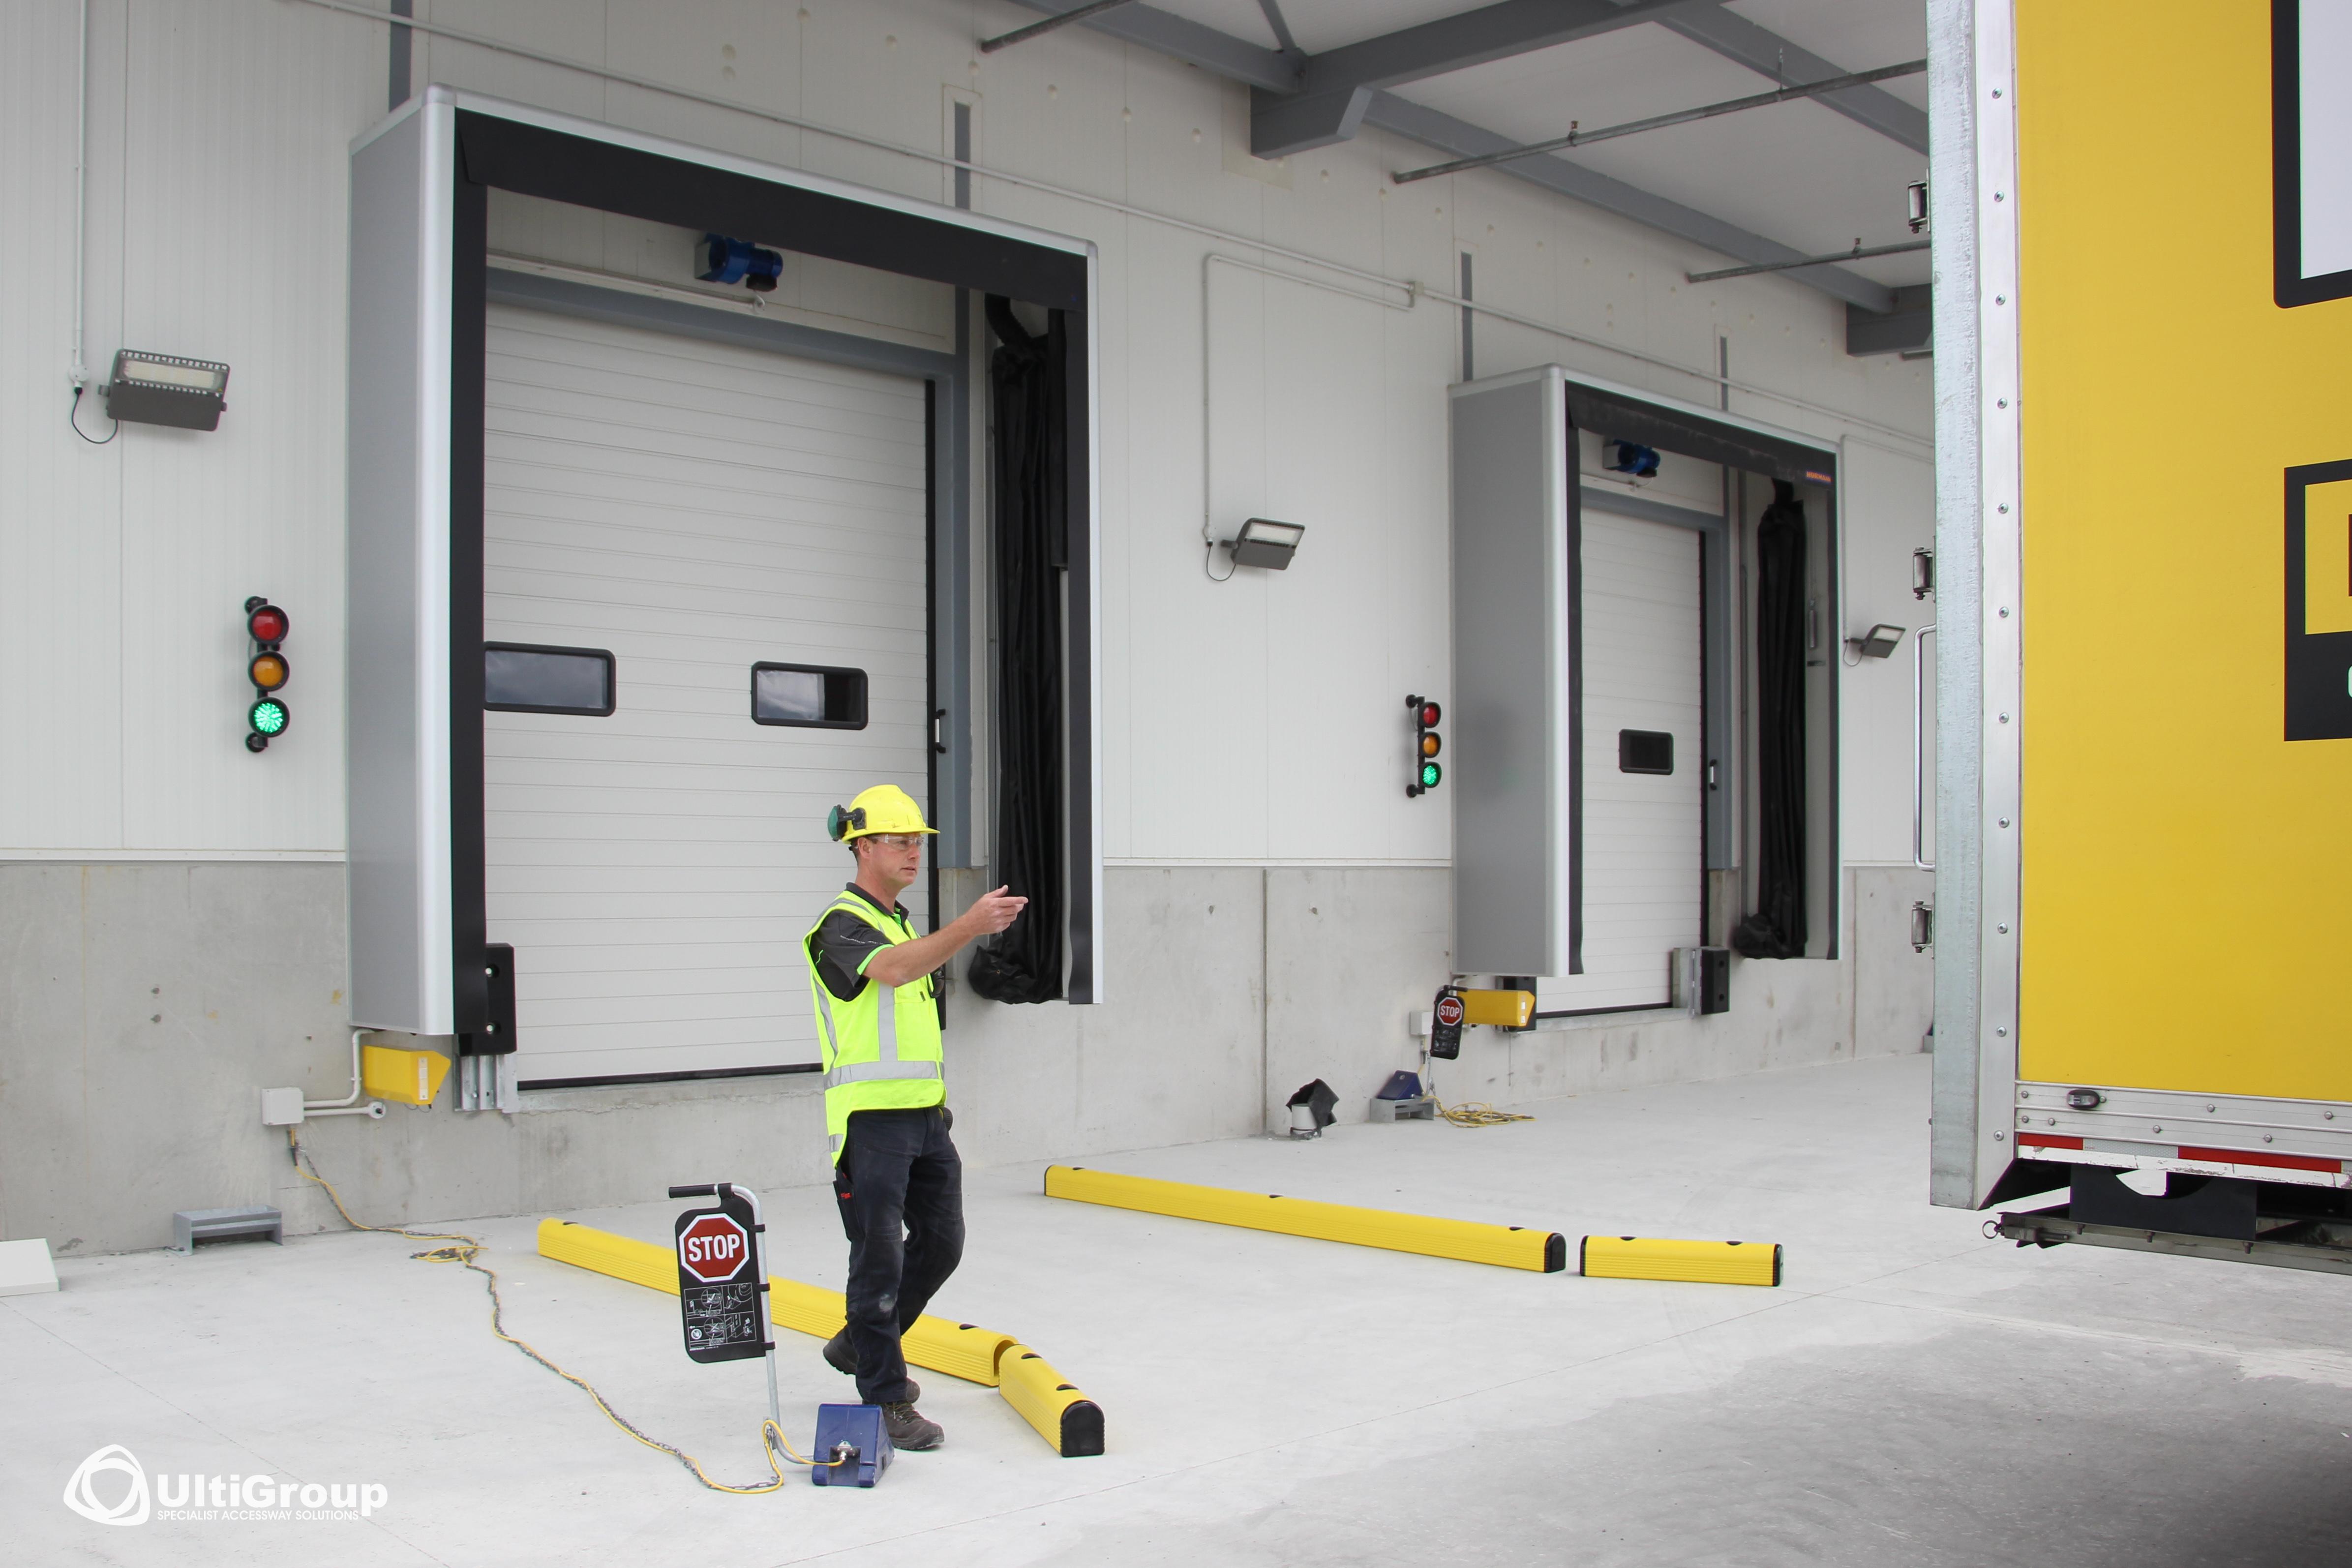 10 Ways to Maximise Safety at the Loading Dock